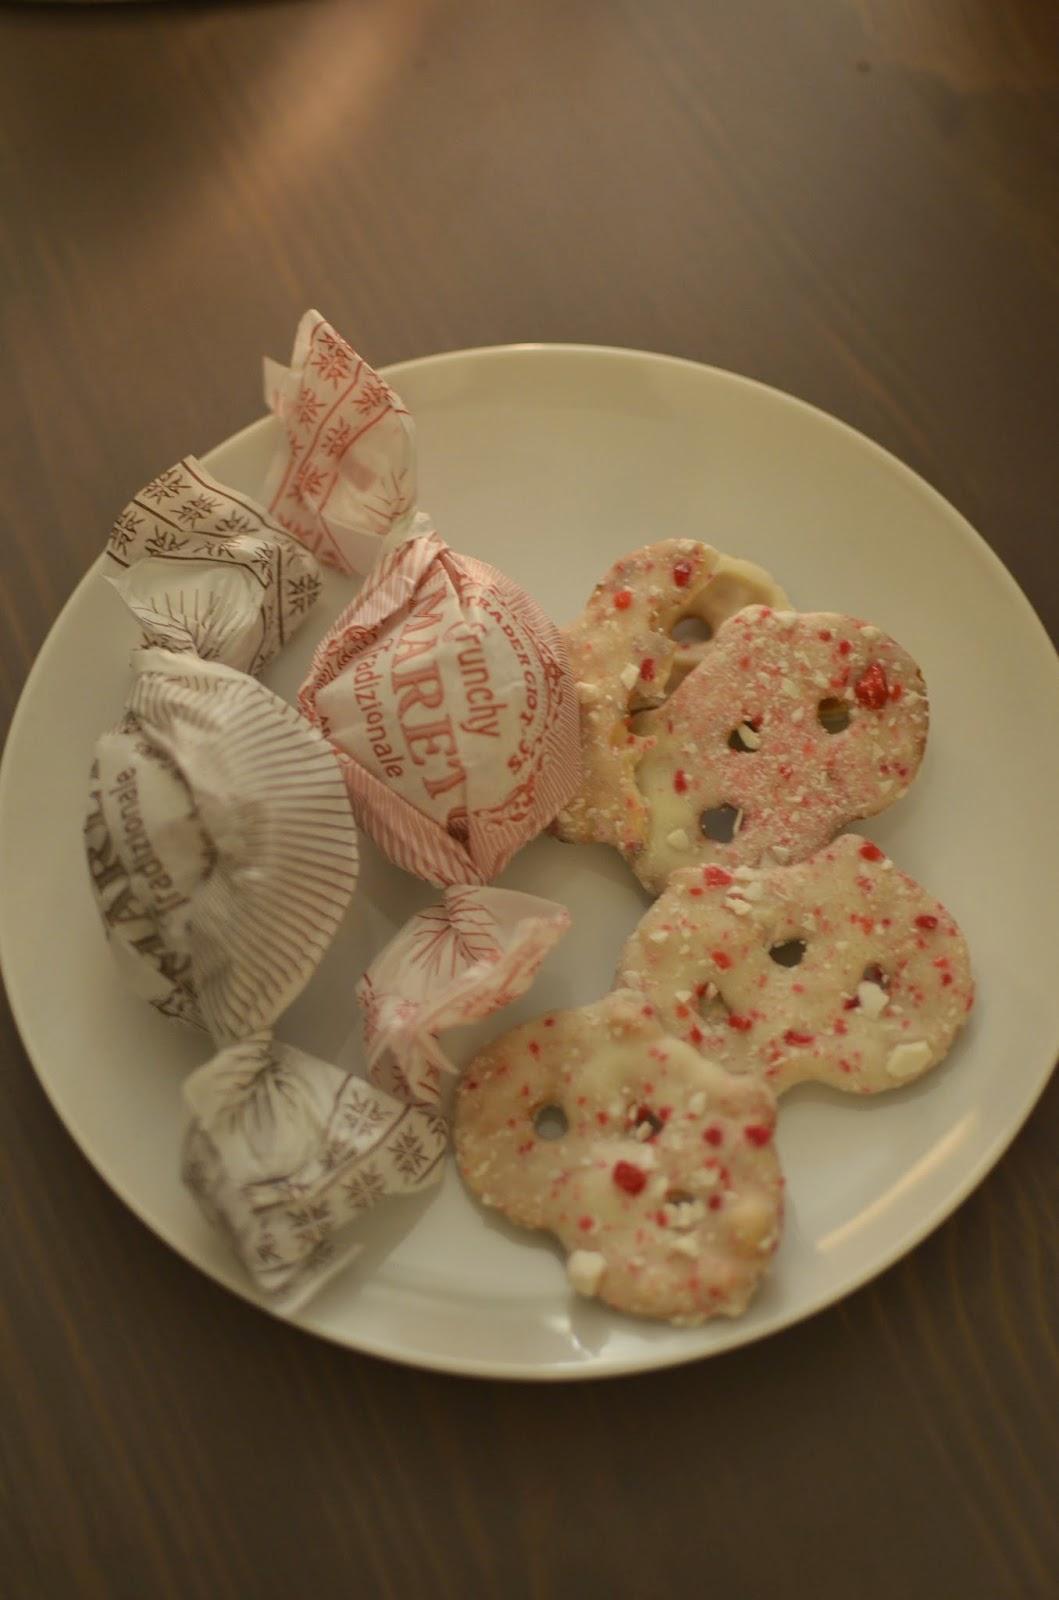 cookies for santa, cookies, sweets, holiday treats